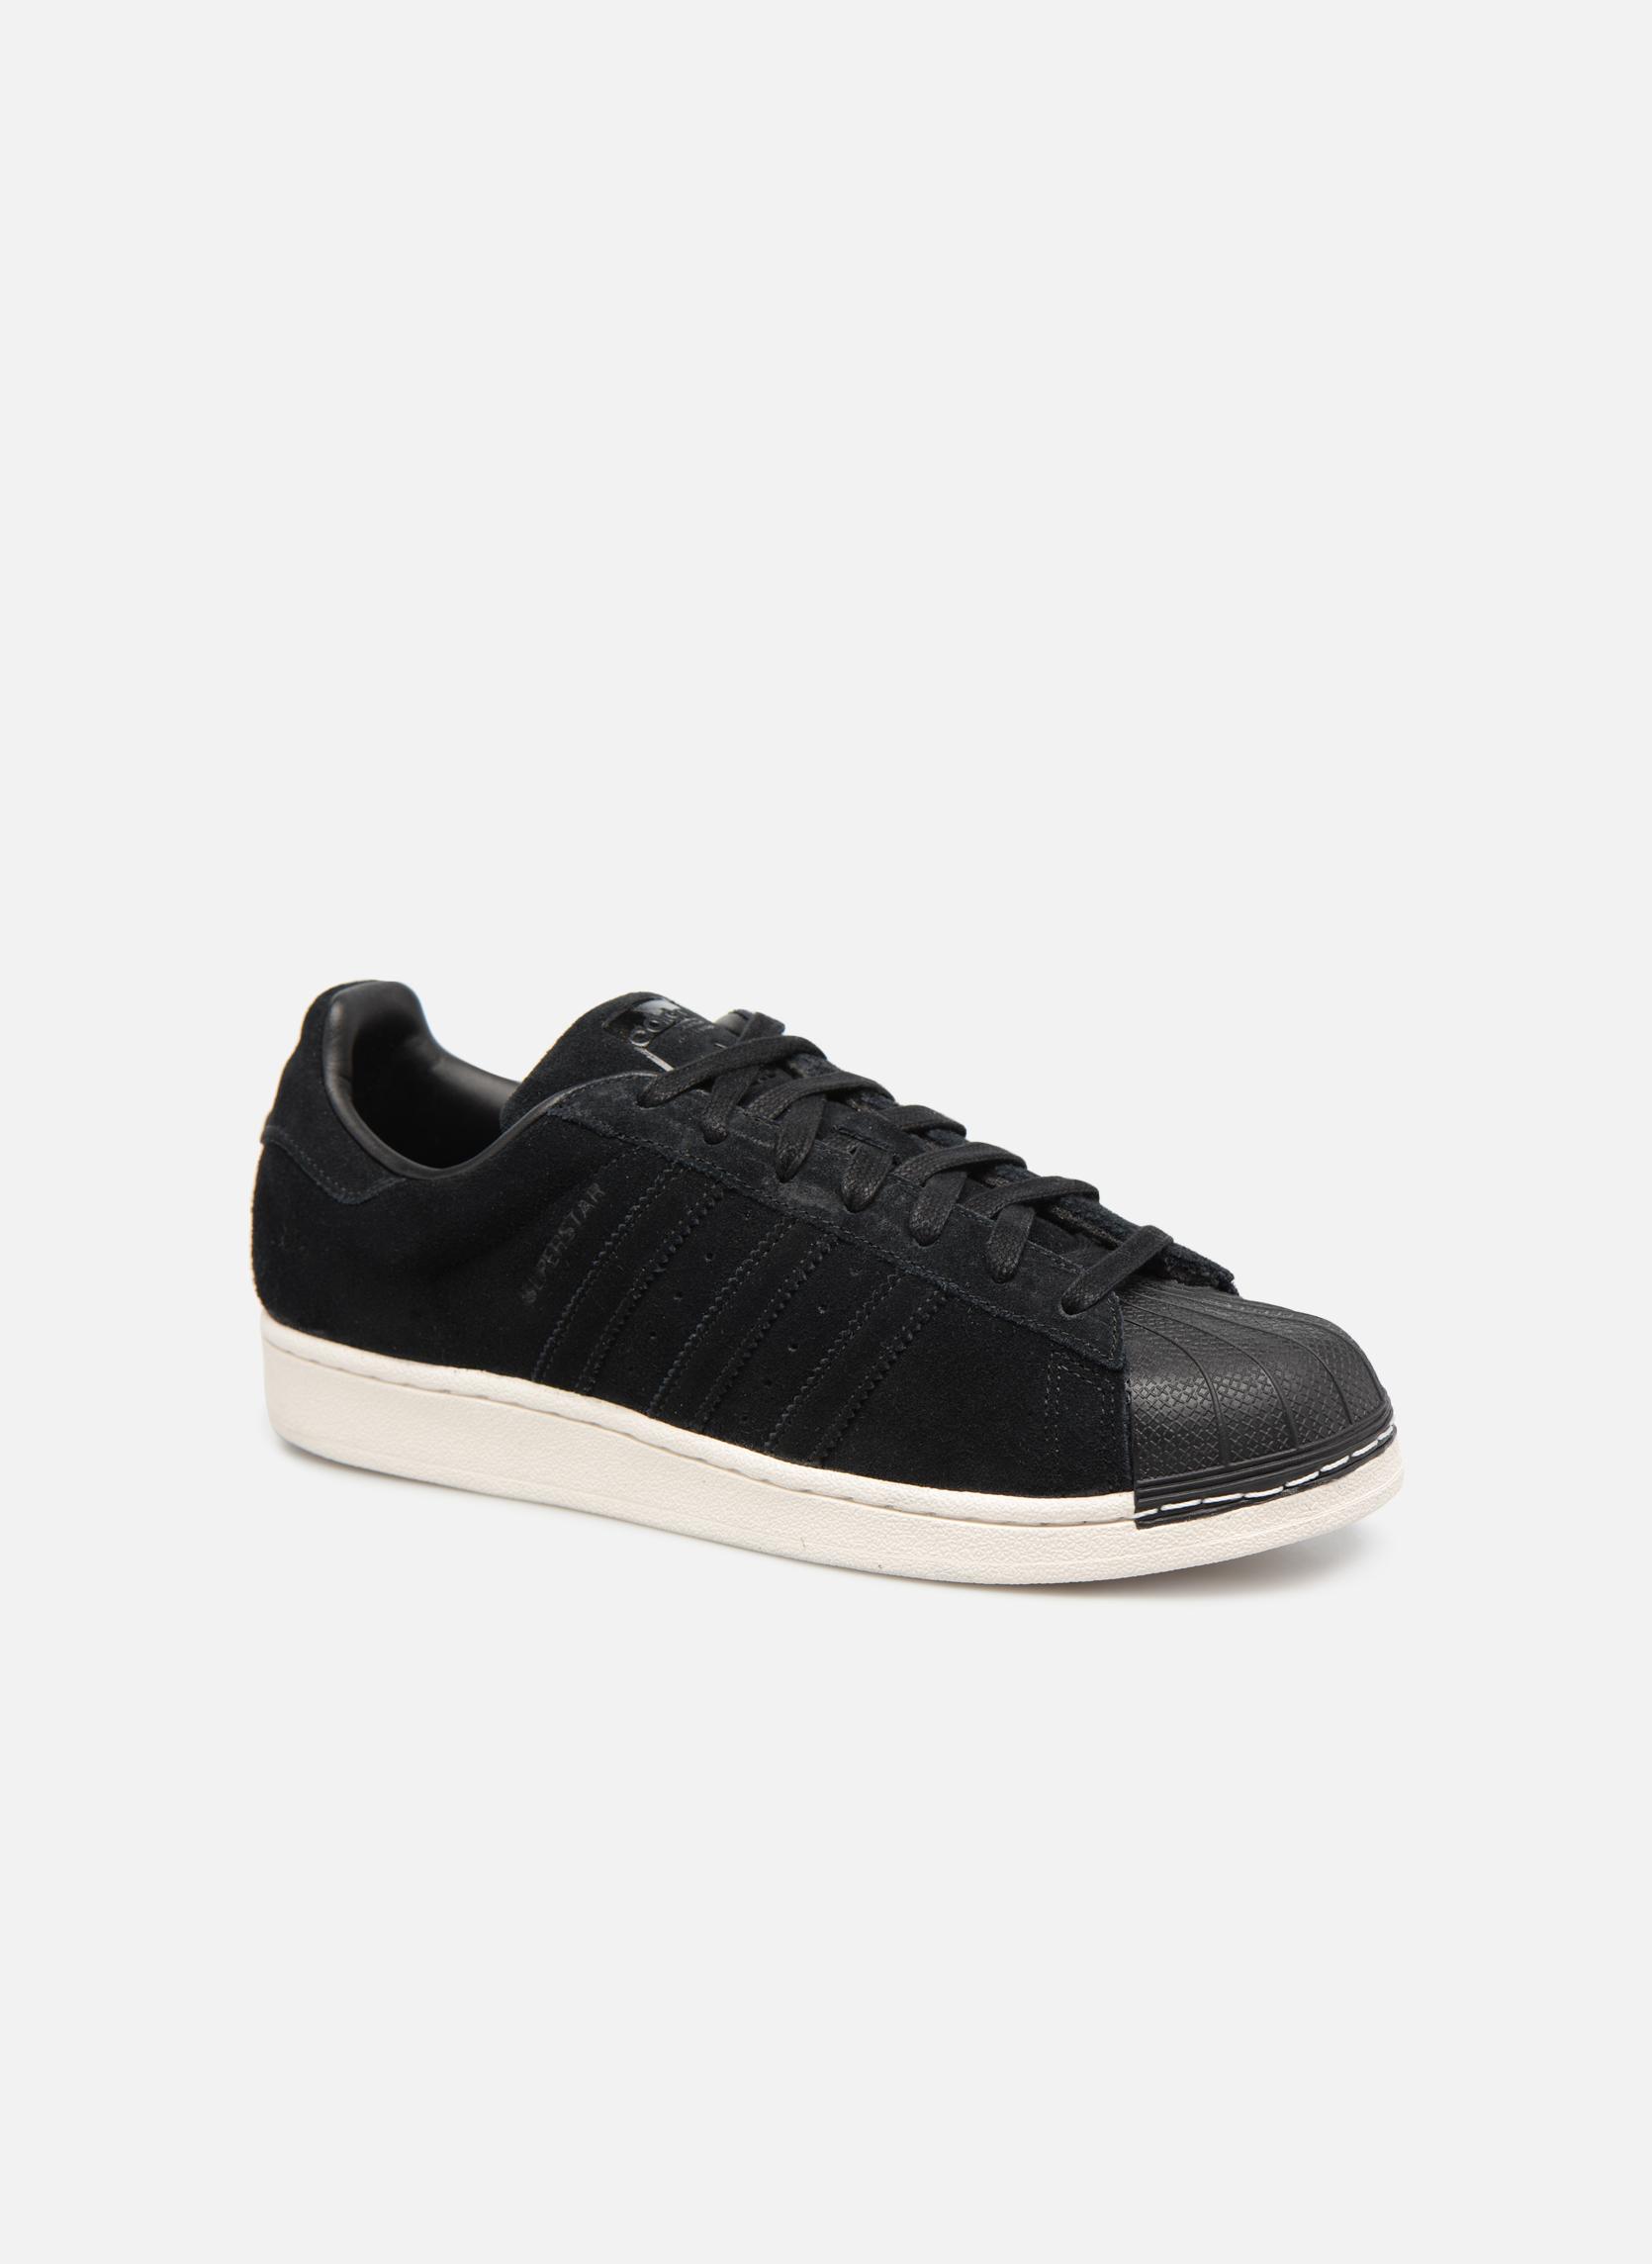 Cblack cblack Adidas Originals cblack Superstar WDIH29E